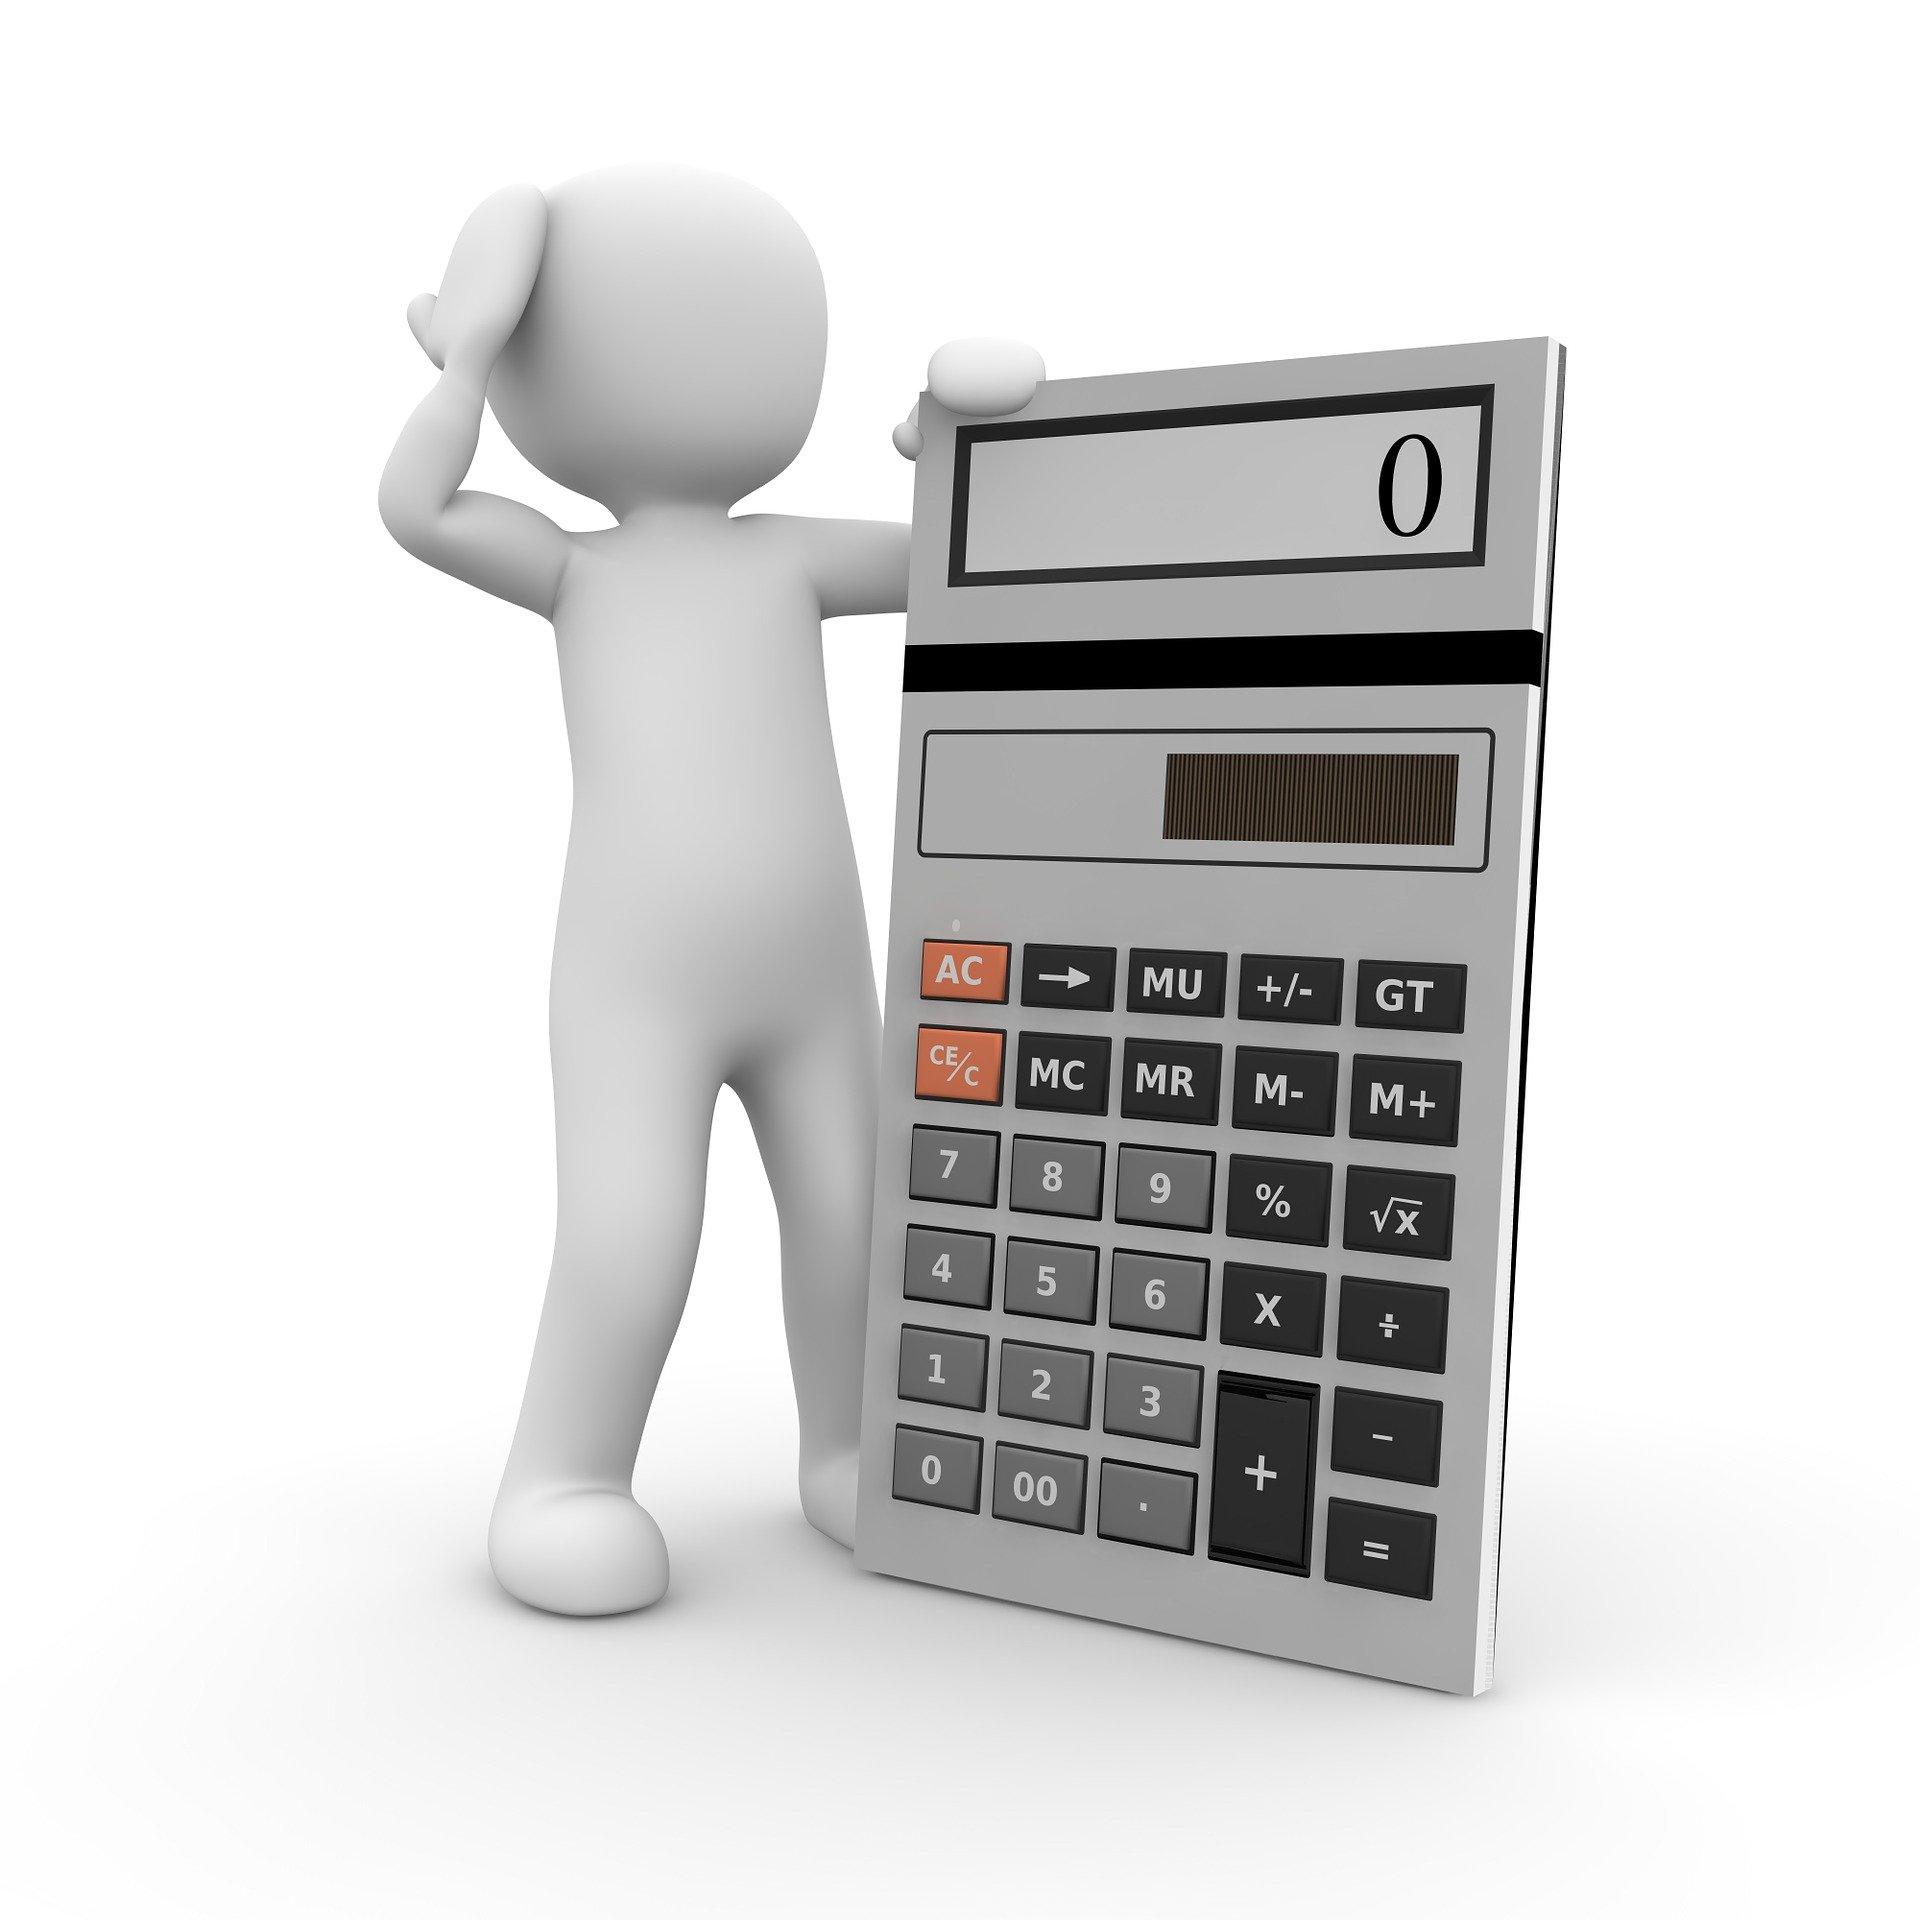 Calculator - FE Electrical Exam